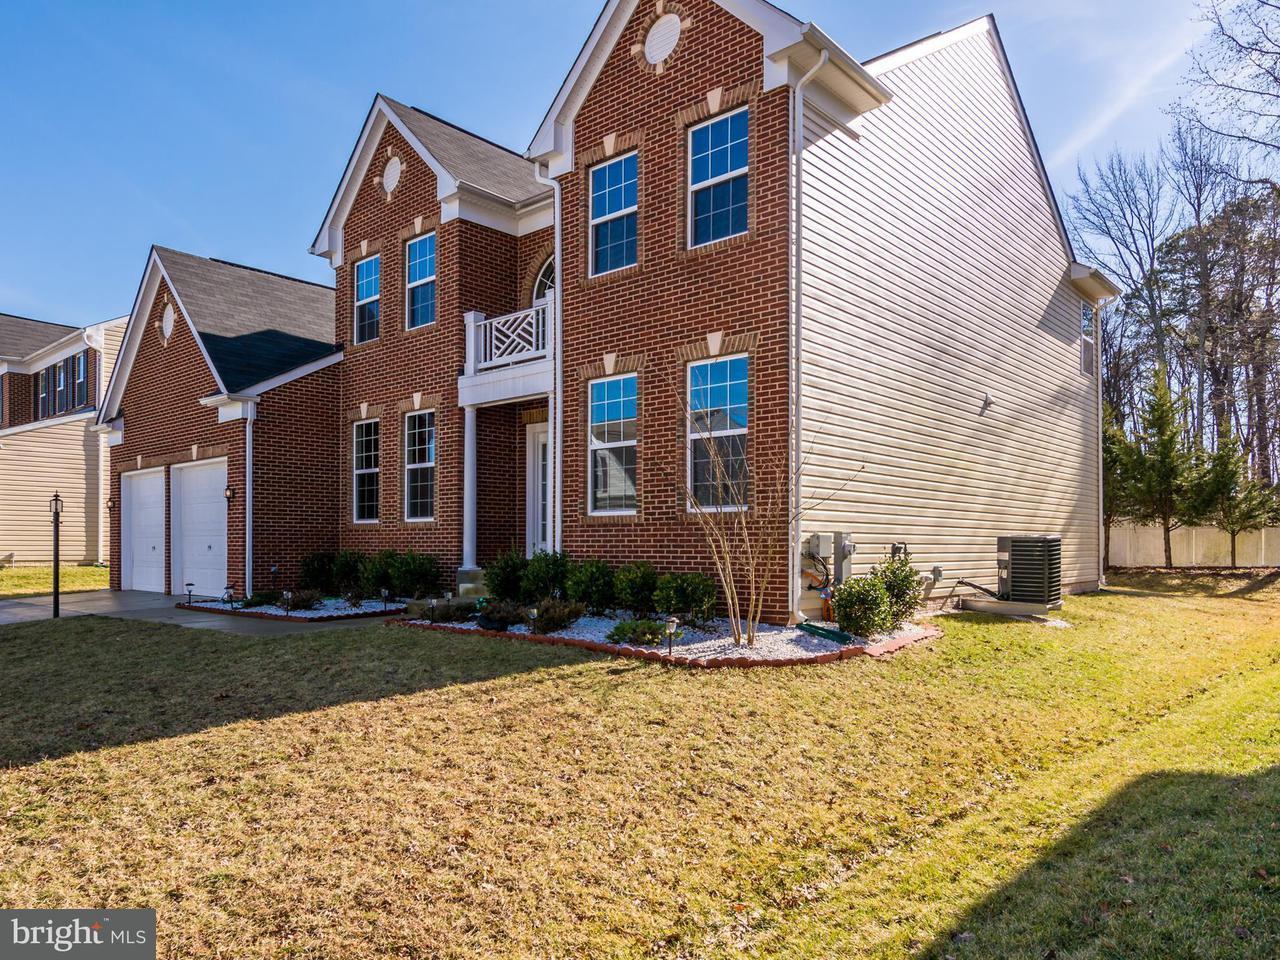 Single Family Home for Sale at 805 Kibec Lane 805 Kibec Lane Severn, Maryland 21144 United States